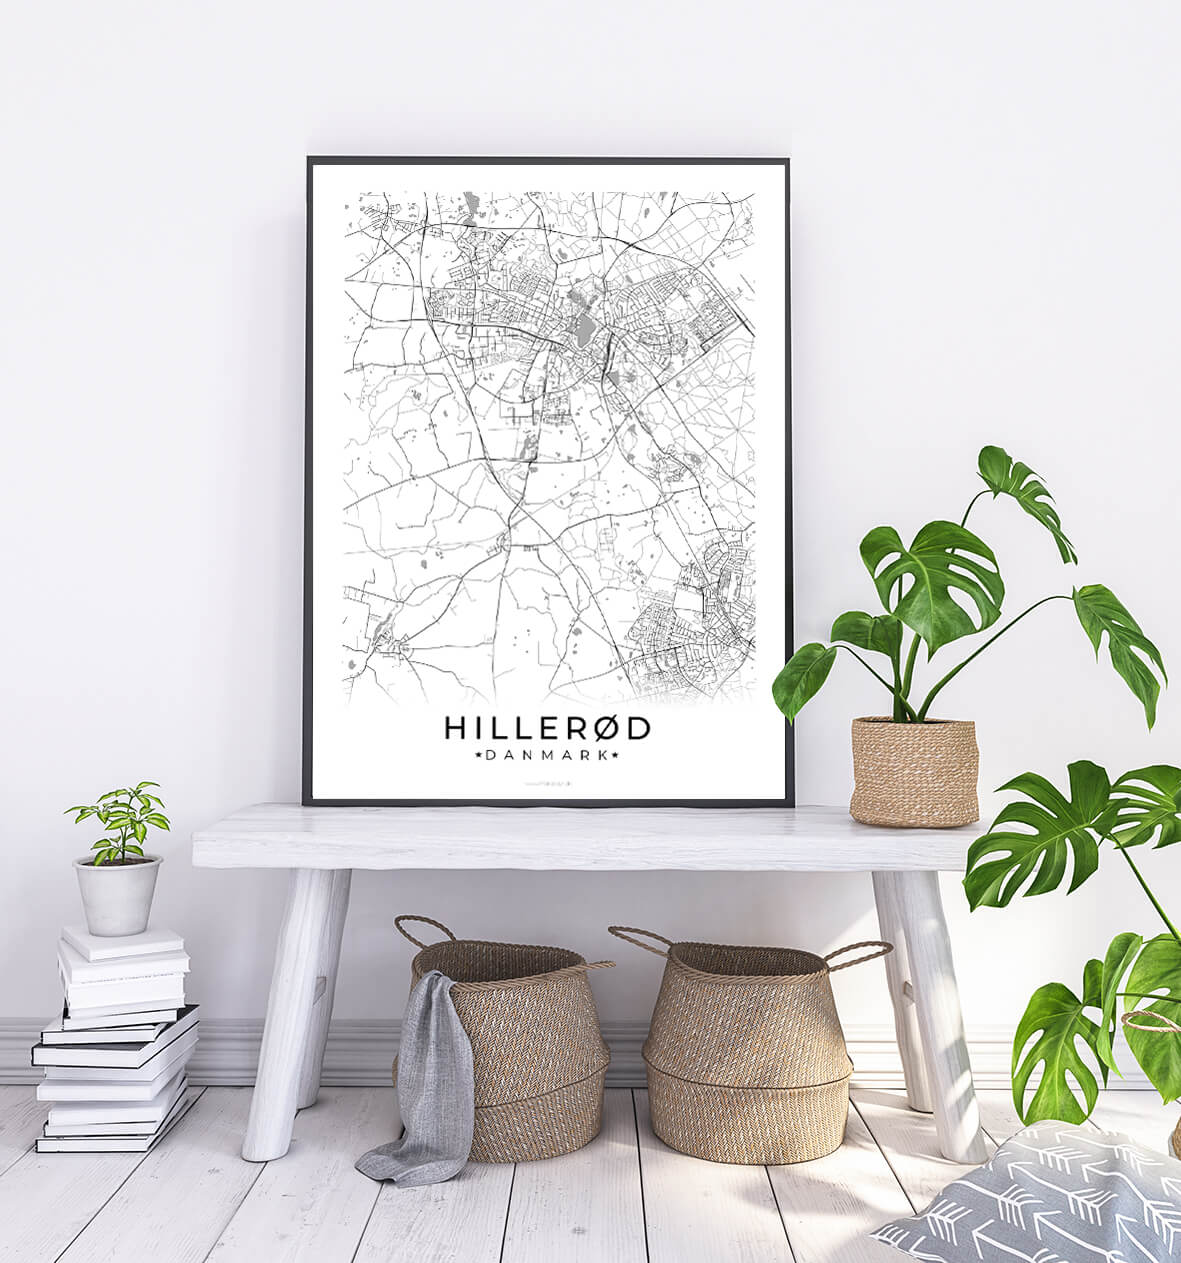 Hilleroed-hvid-byplakat-1